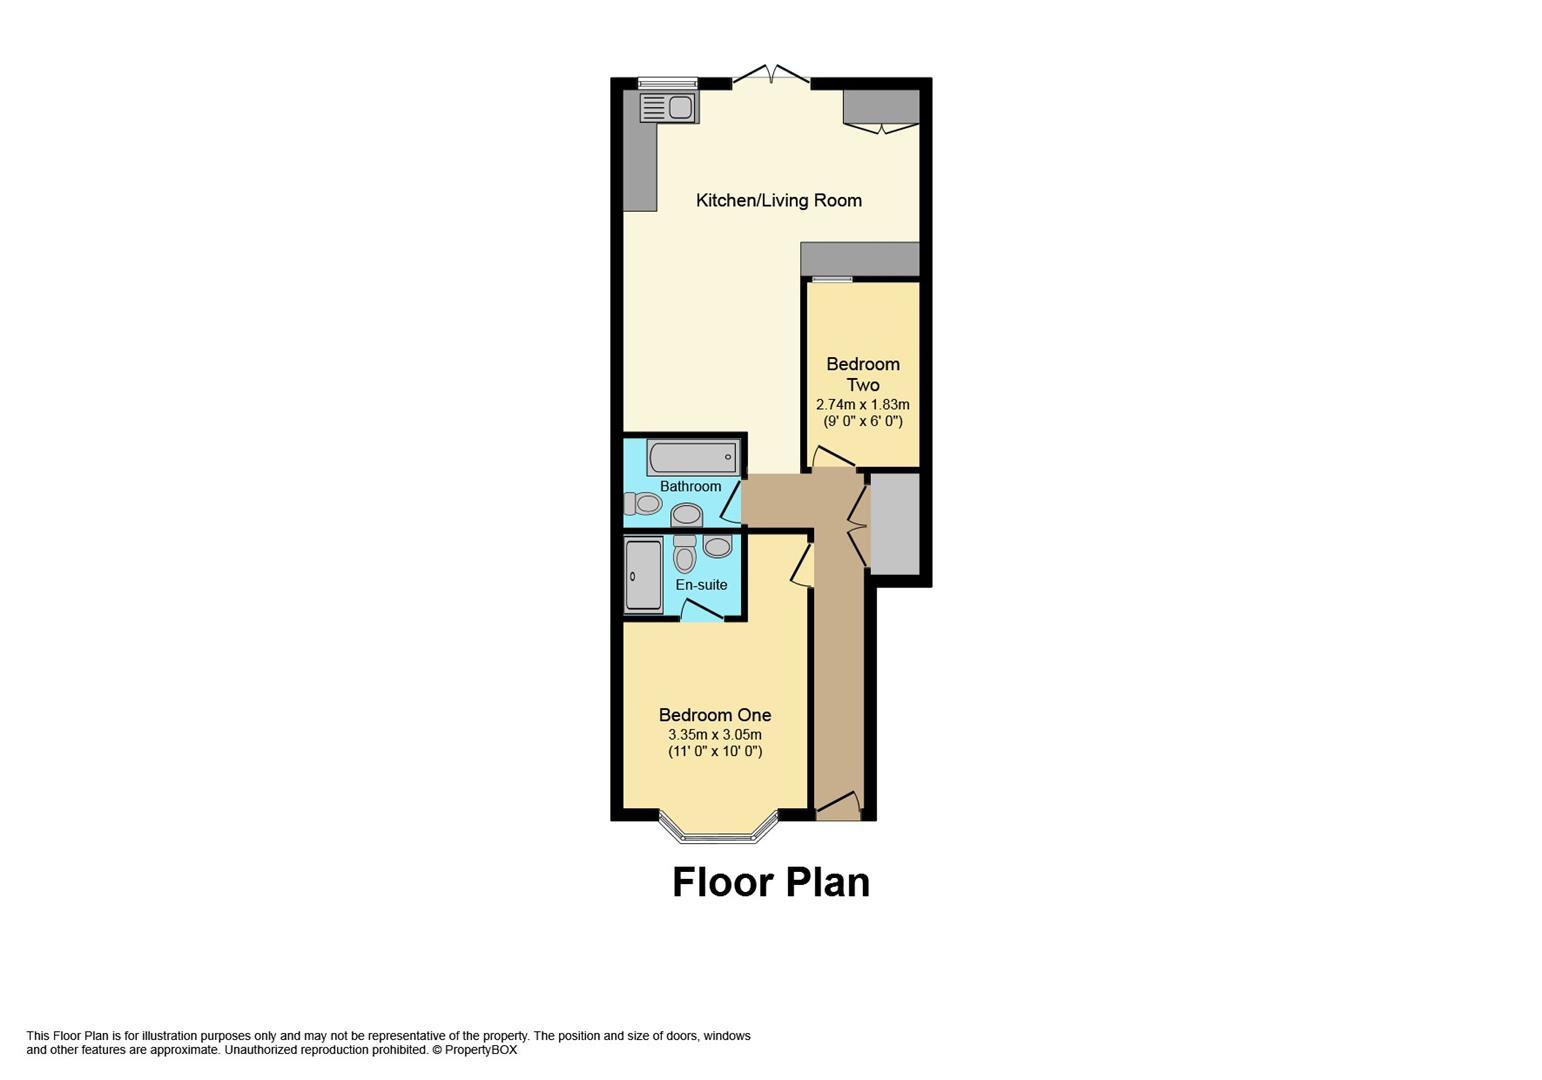 2D_Plan_2 (41).jpg